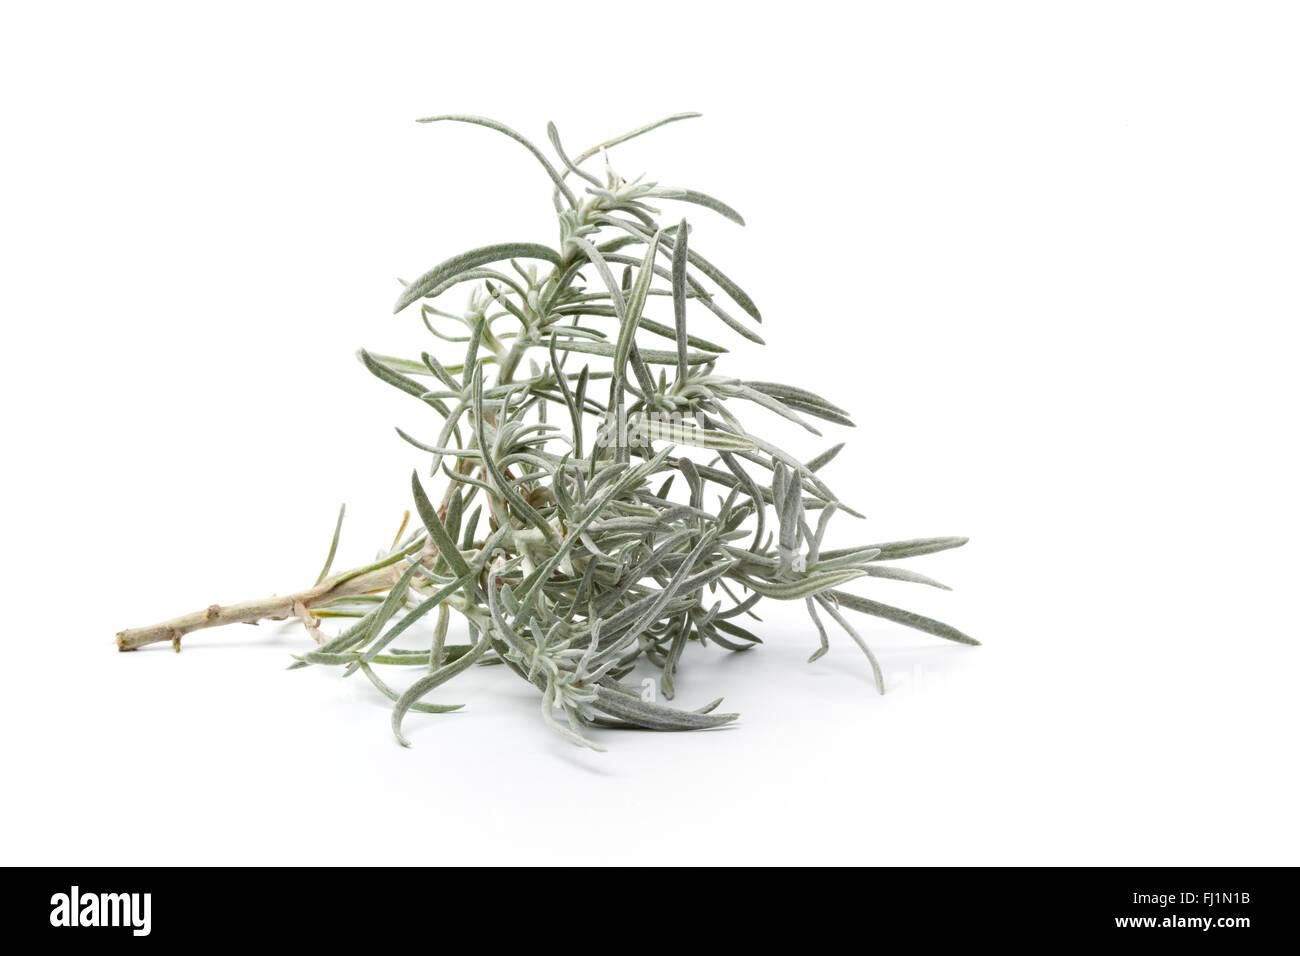 Twig of young Helichrysum italicum on white background - Stock Image